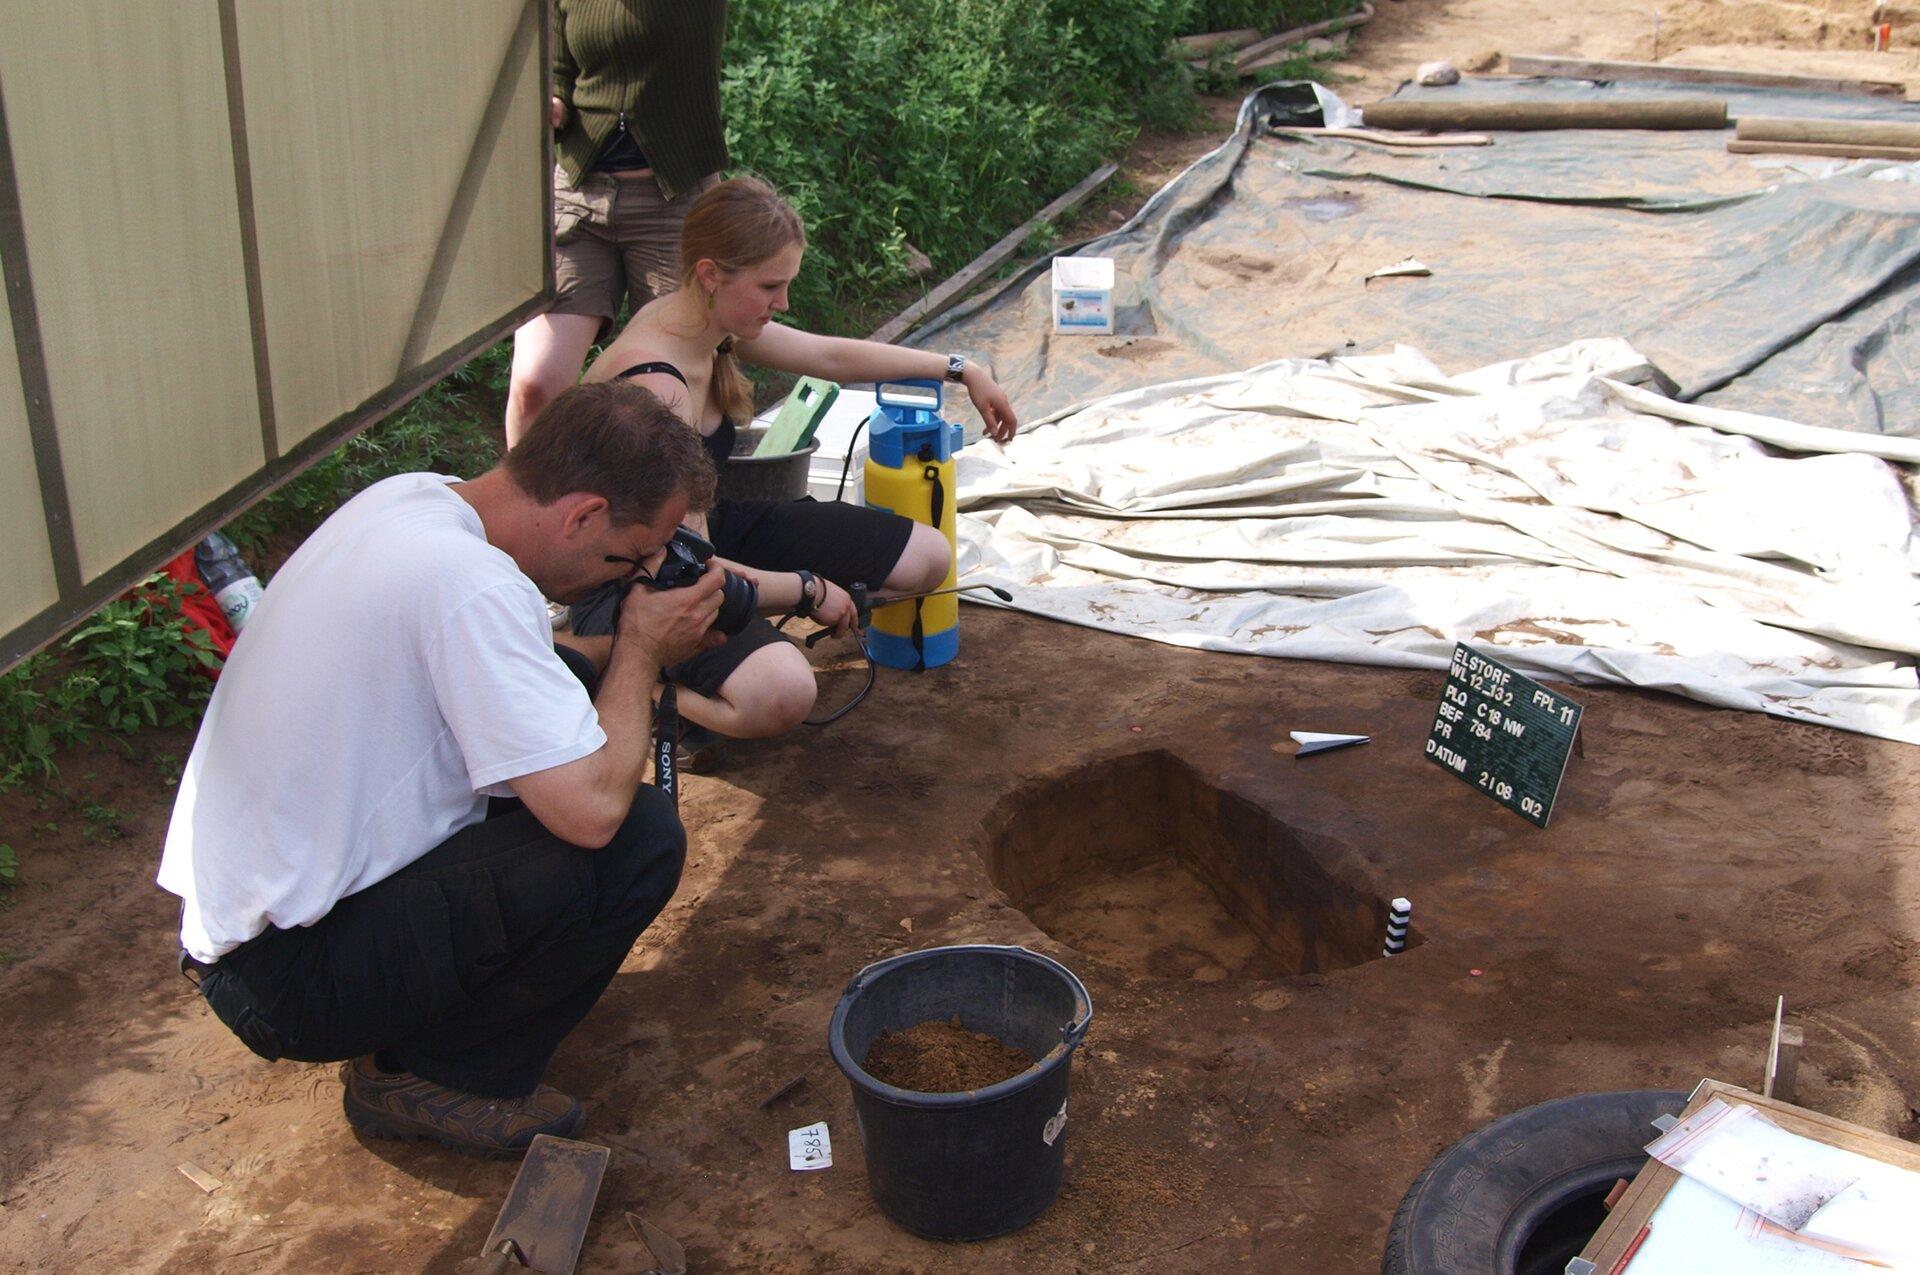 Archeolodzy przy pracy Archeolodzy przy pracy Źródło: Bullenwächter, Wikimedia Commons, licencja: CC BY-SA 3.0.